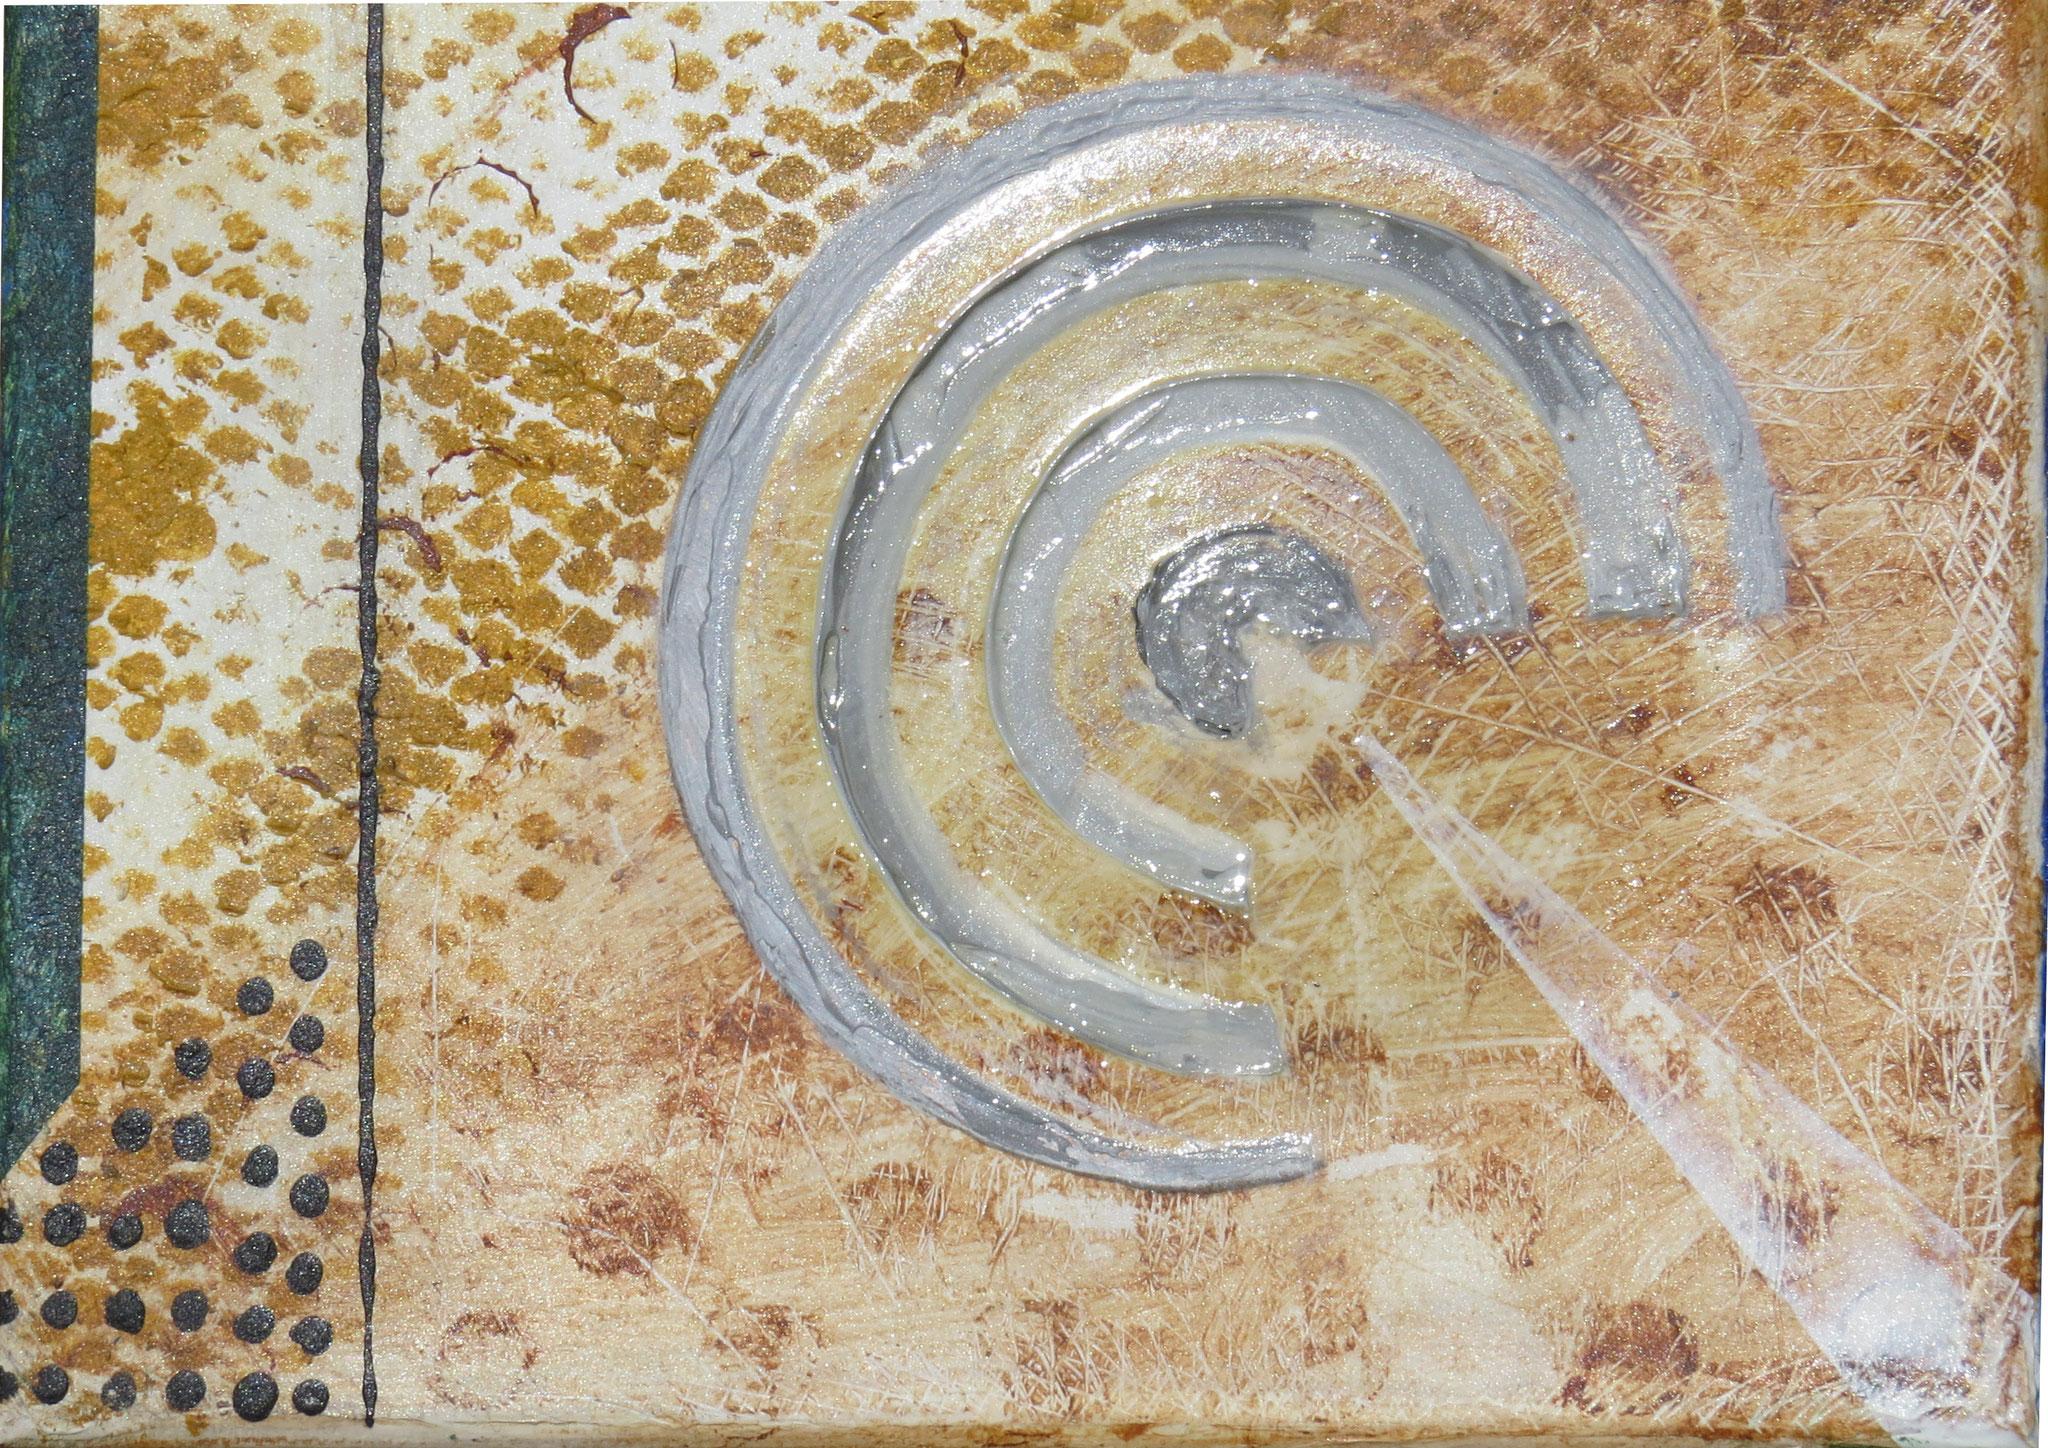 syncrétisme. vue de zoom6 - daluz galego tableau abstrait abstraction